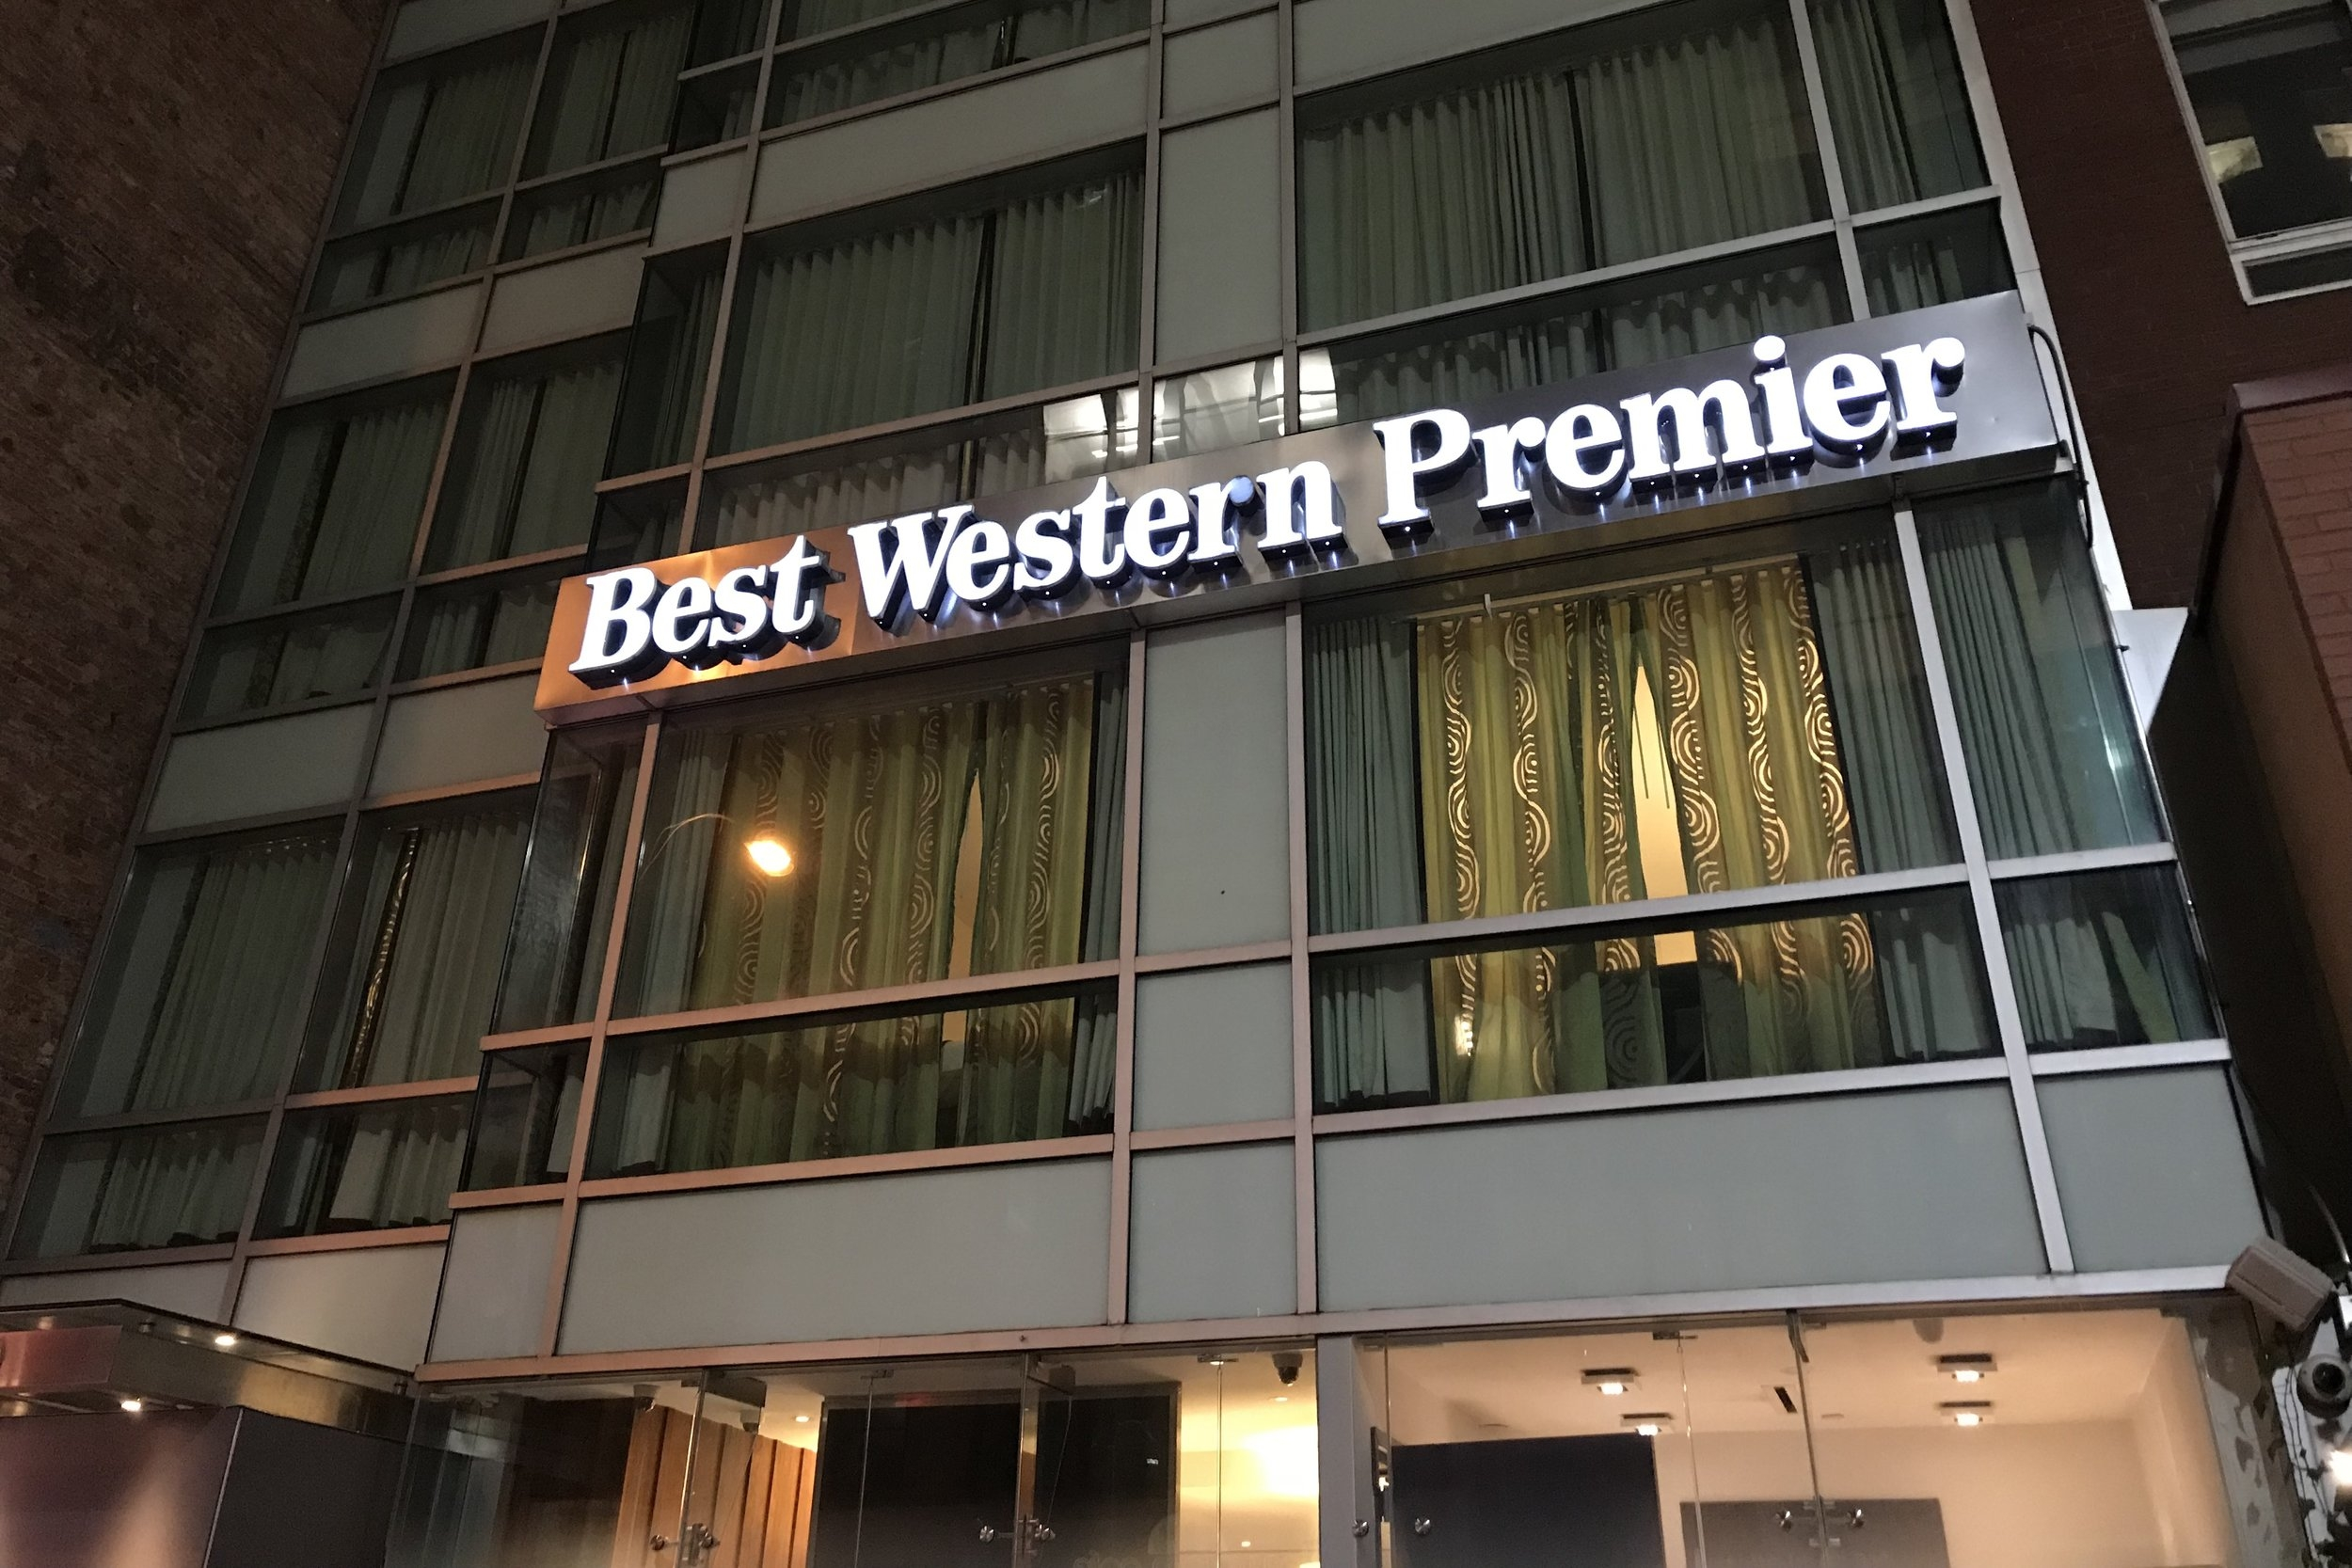 Best Western Premier New York Herald Square – Sign